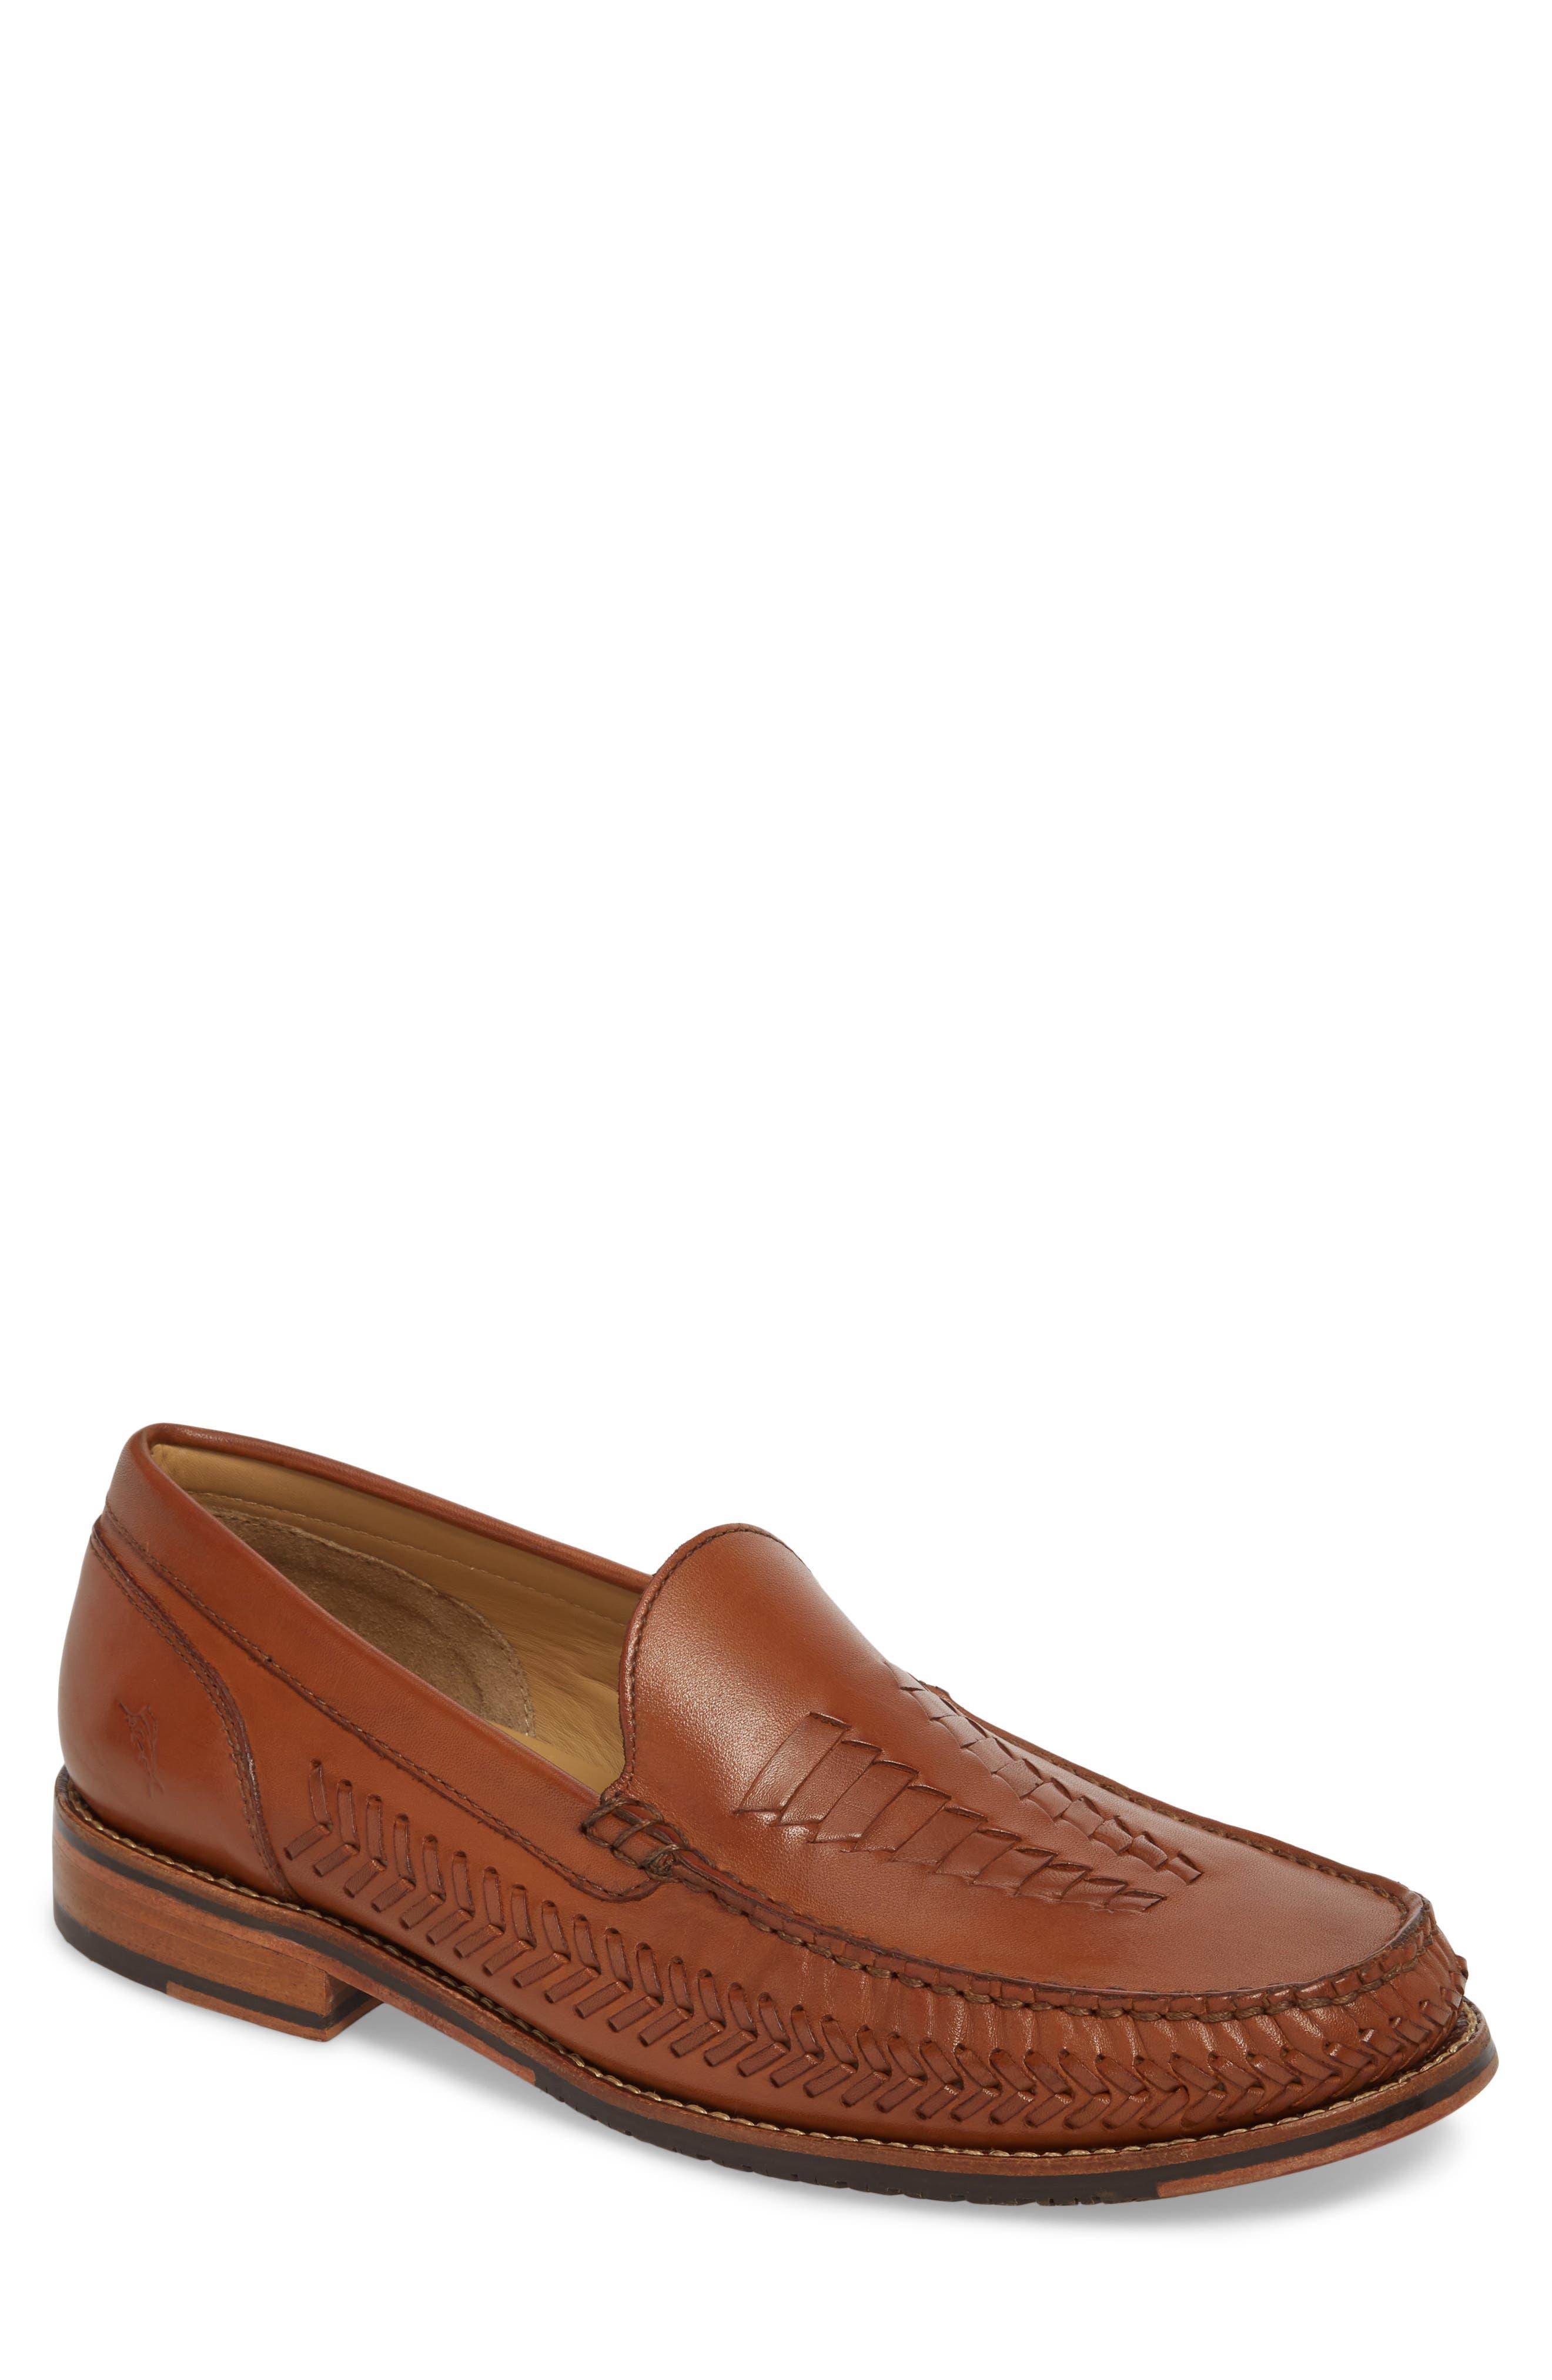 Hasslington Woven Venetian Loafer,                         Main,                         color, Tan Leather